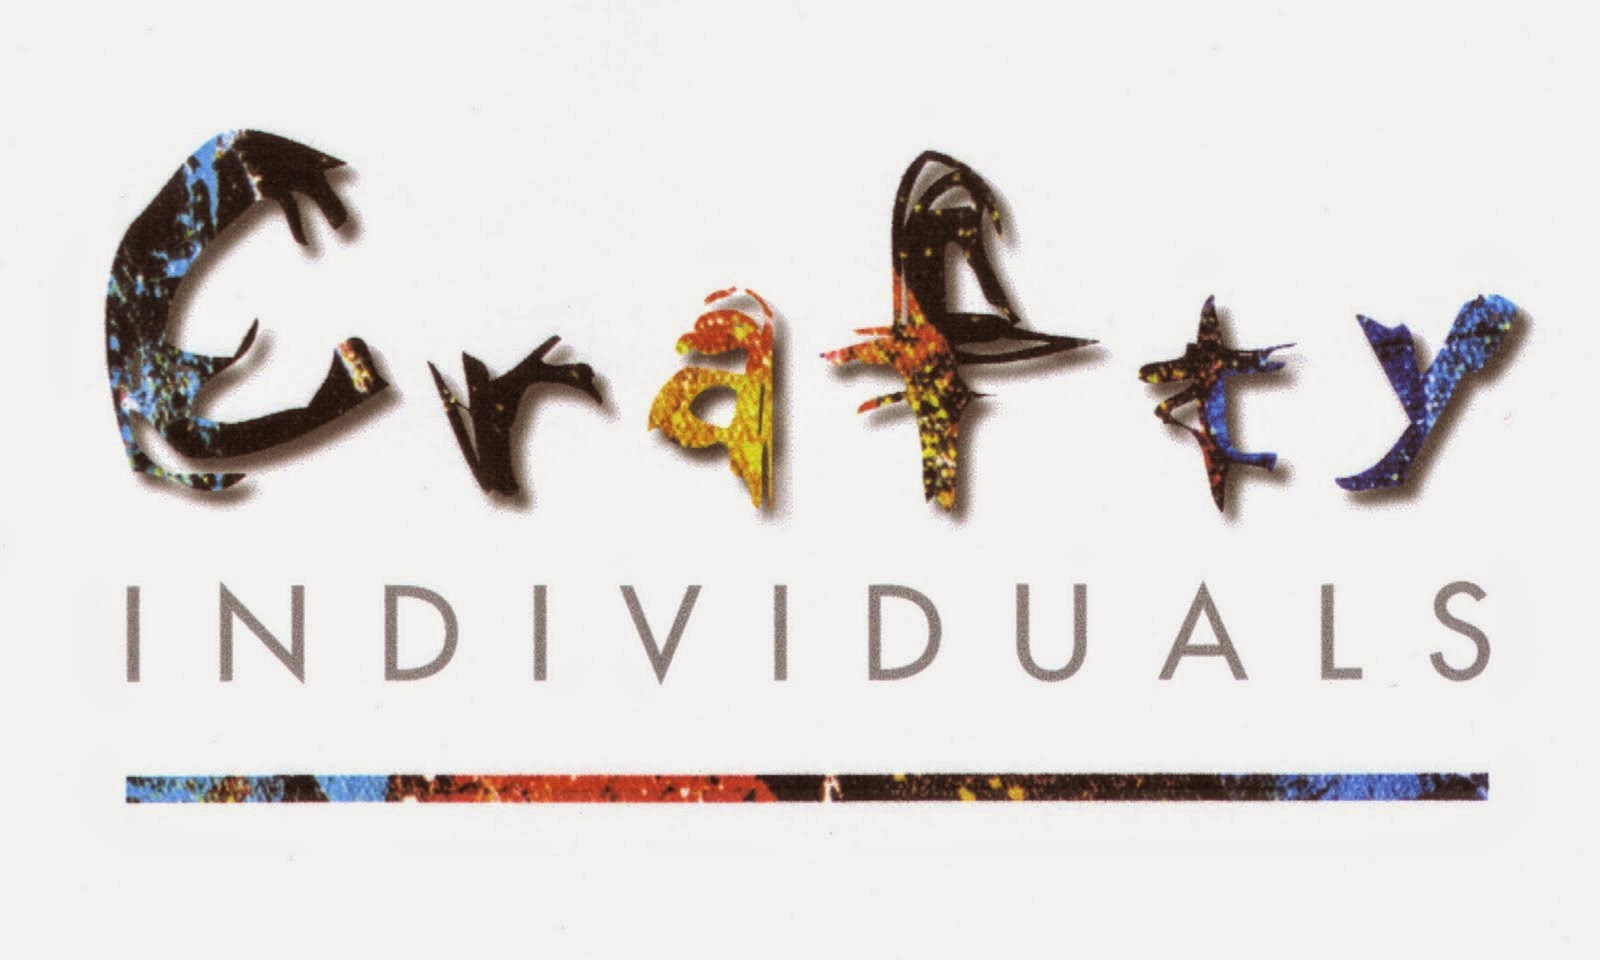 http://www.craftyindividuals.co.uk/